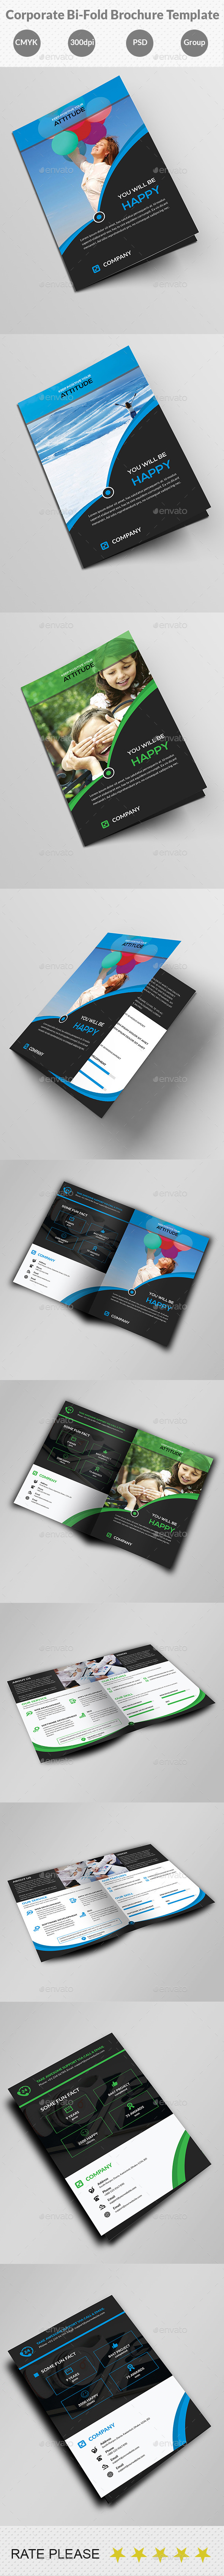 GraphicRiver Corporate Bi-Fold Brochure Template 10606208